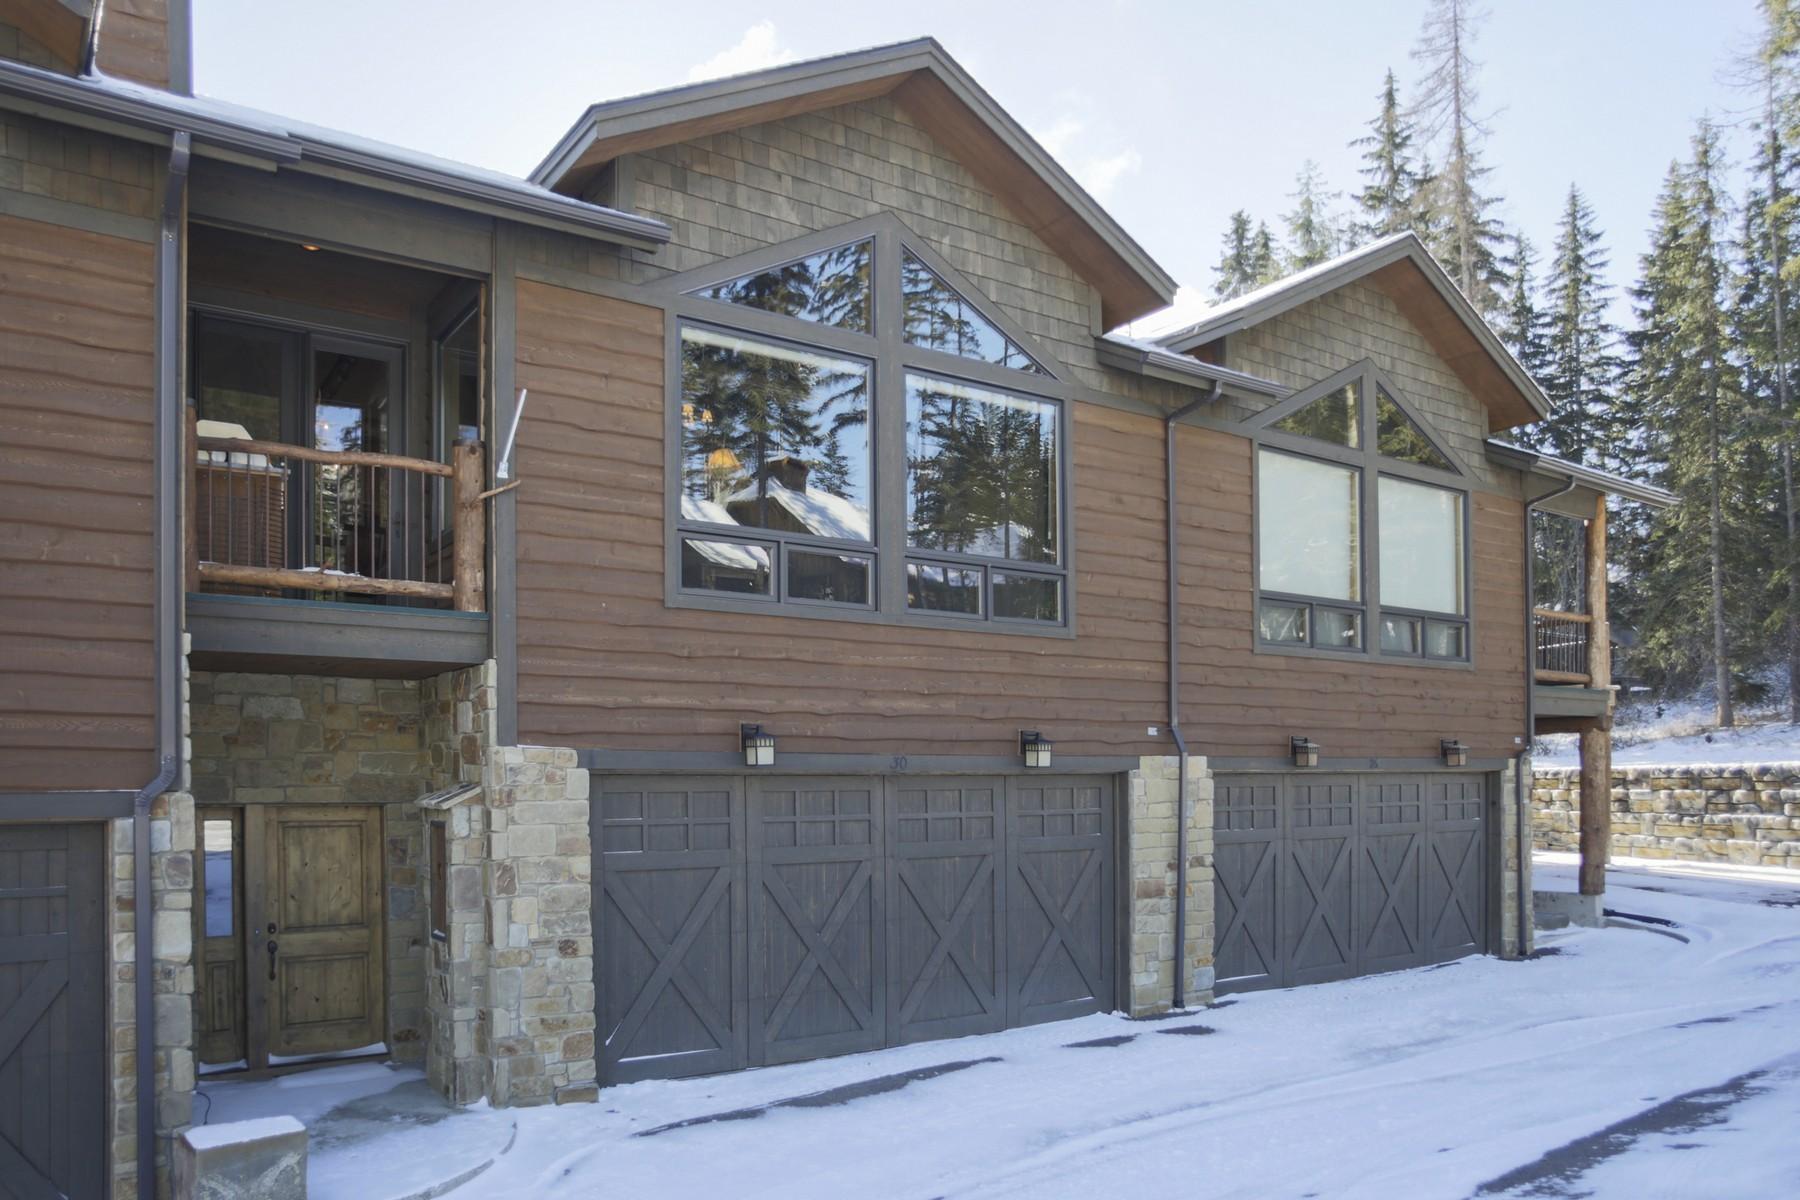 Casa Unifamiliar Adosada por un Venta en Moose Run Townhome 30 Moose Jaw Trail Whitefish, Montana 59937 Estados Unidos